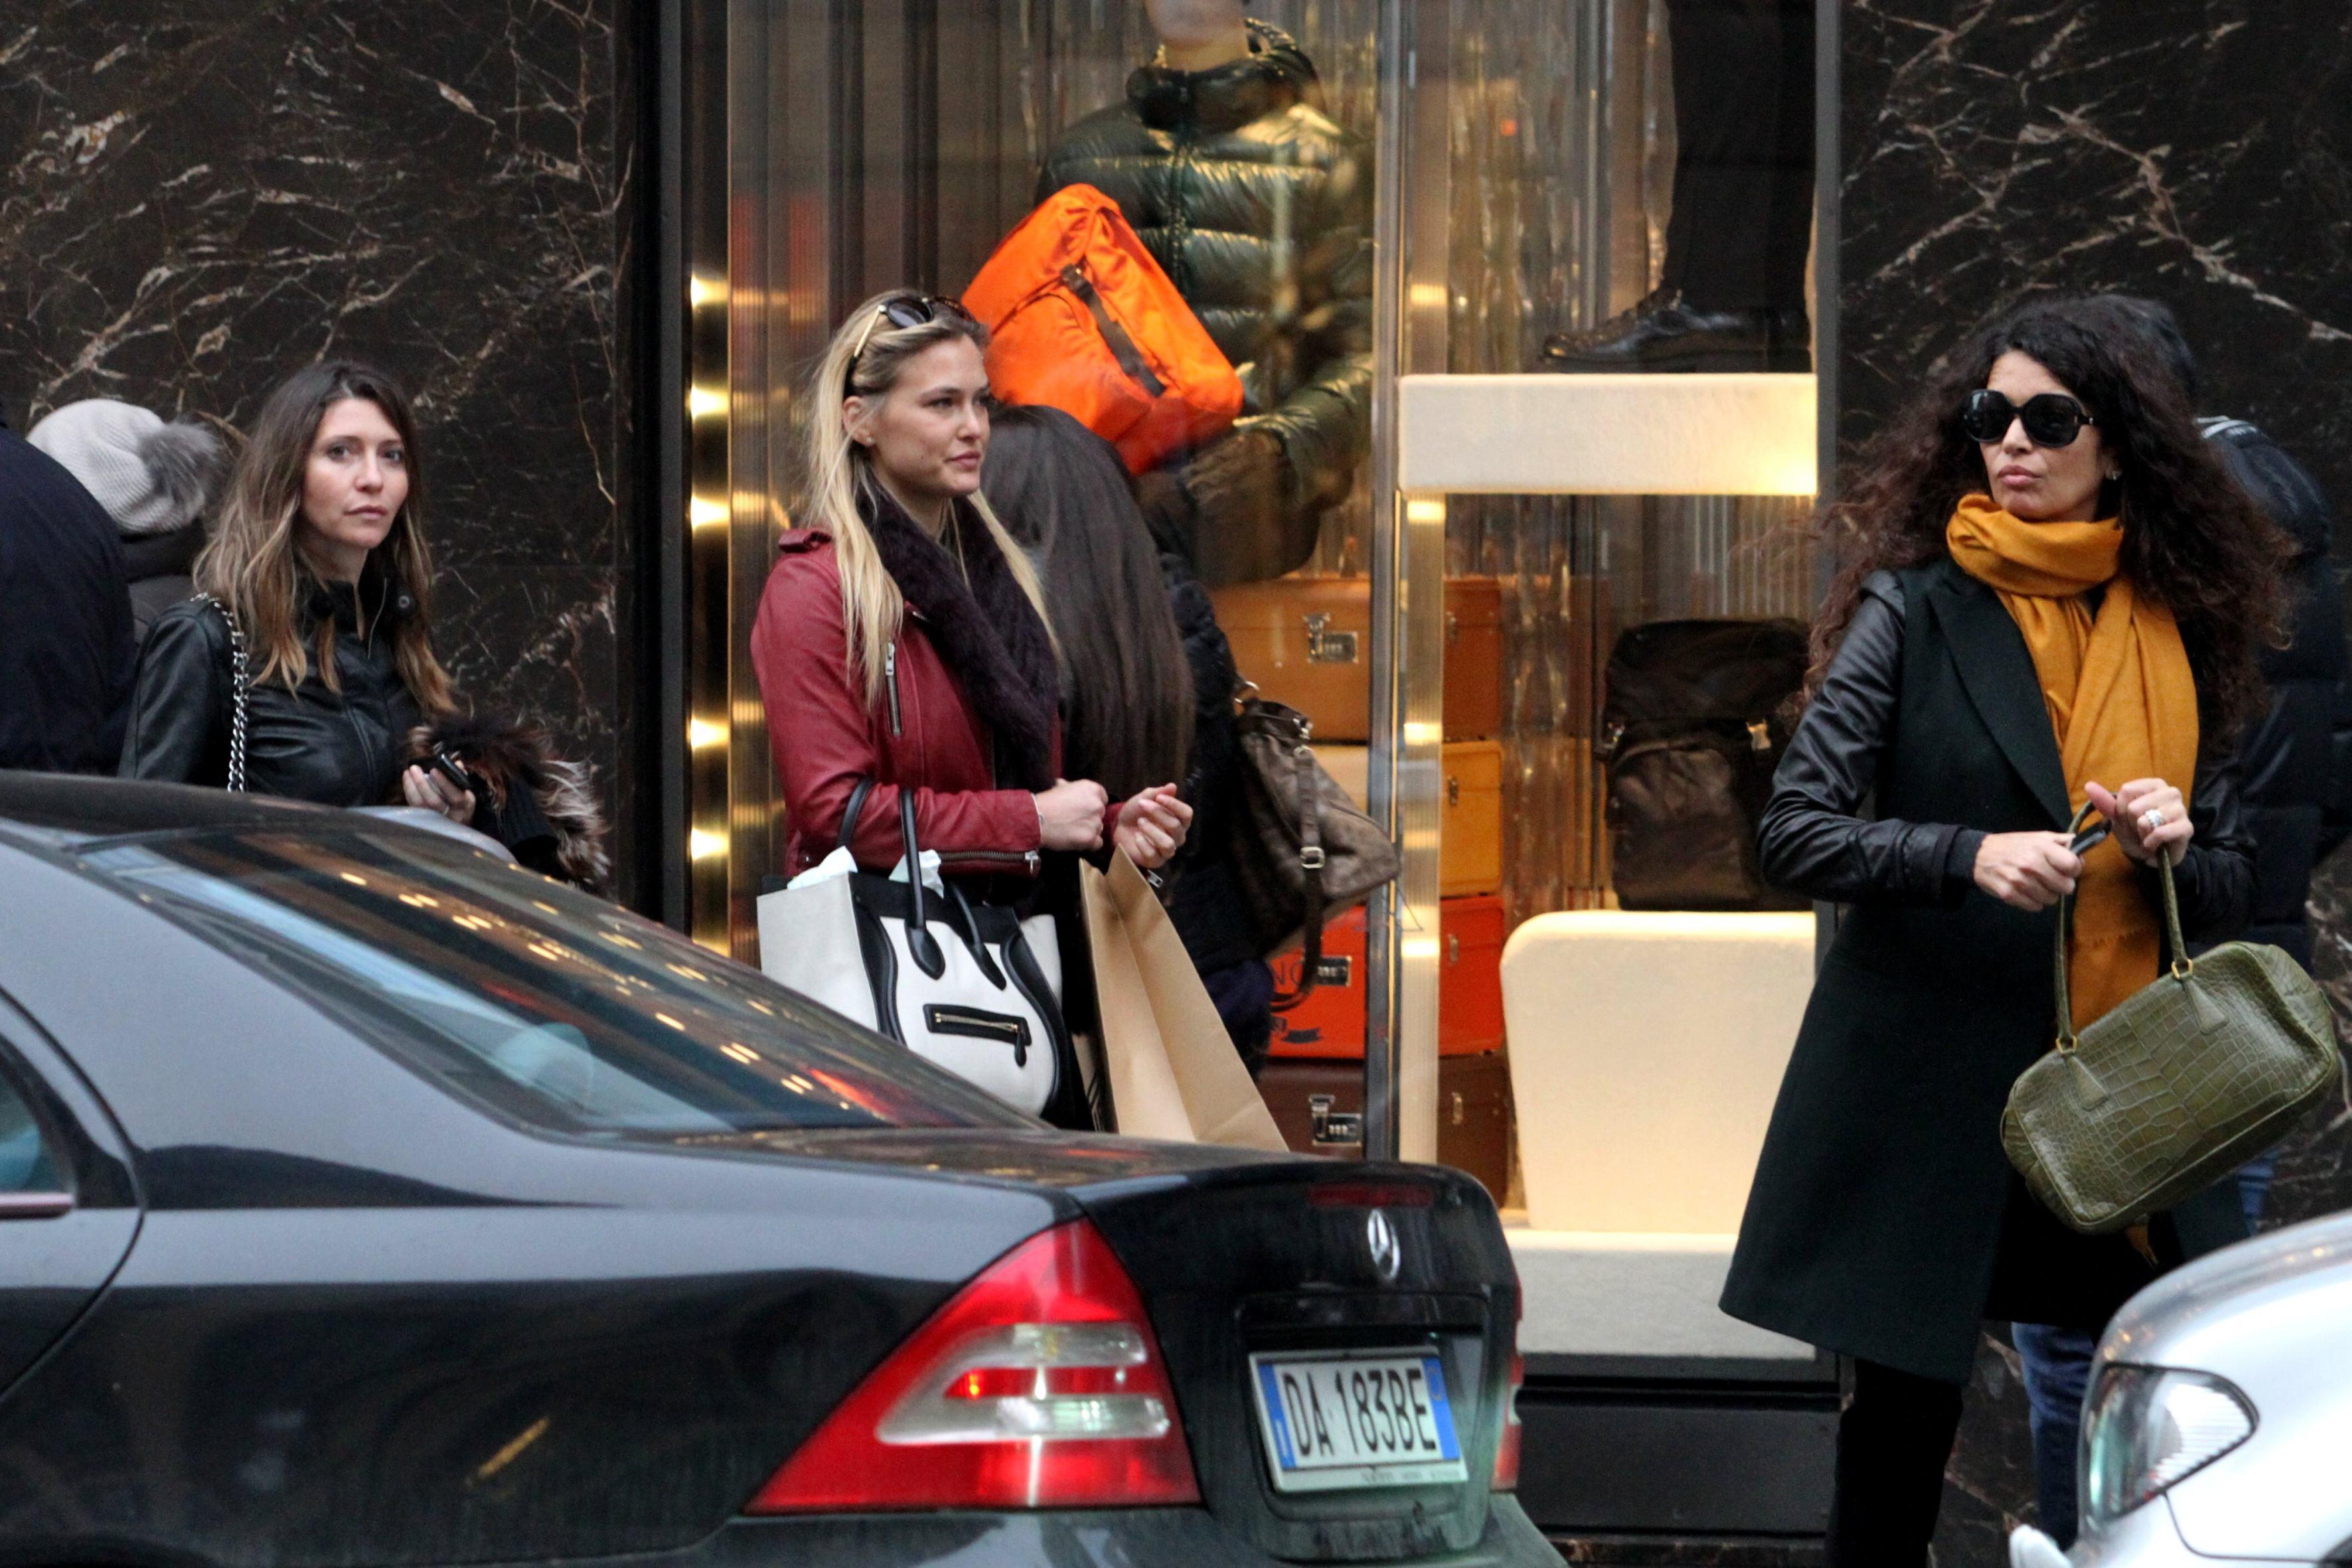 82299_Preppie_Bar_Refaeli_at_The_Pirelli_Store_in_Milan_19_122_483lo.JPG